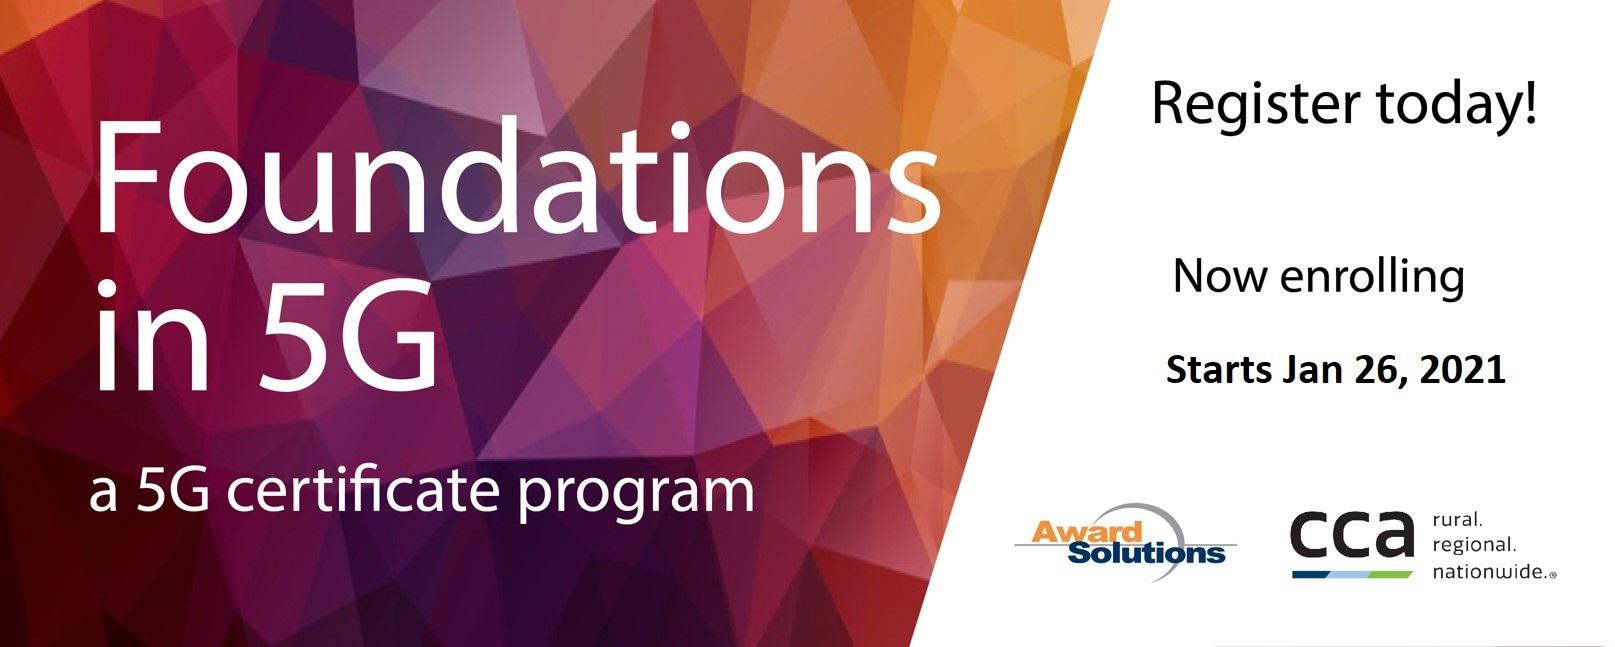 Foundations in 5G _ Jan 26, 2021.jpg